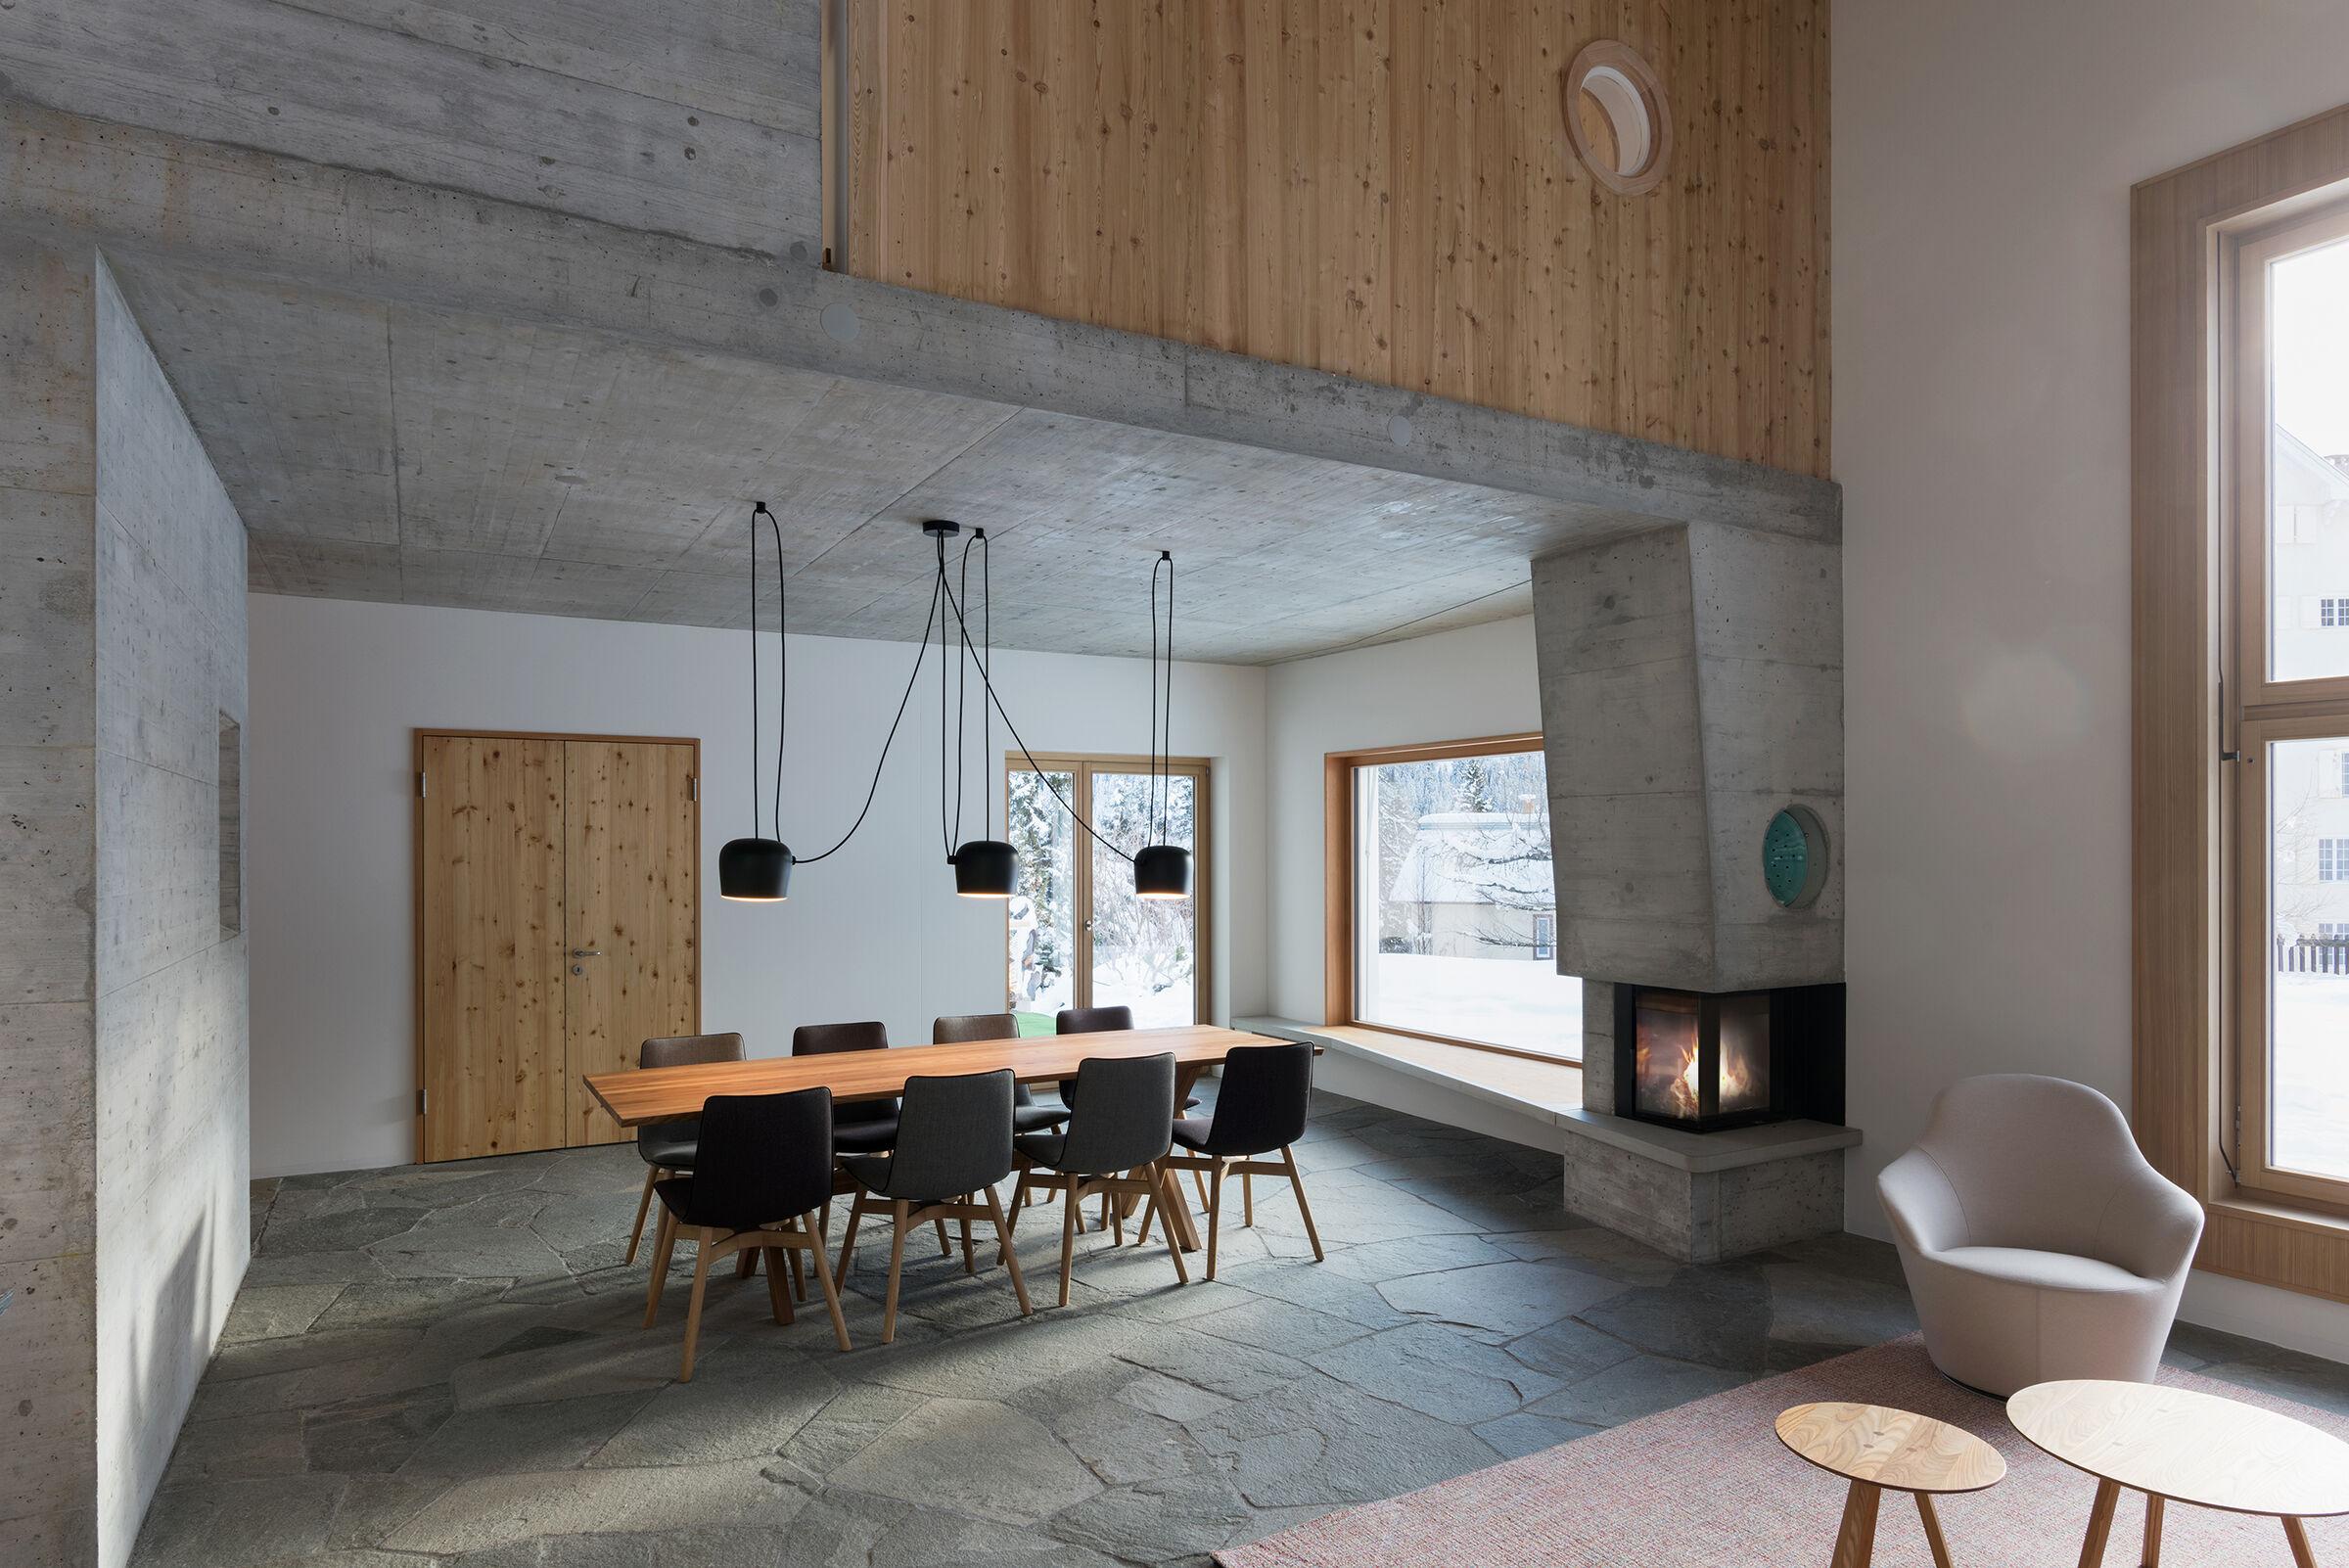 dade design – concrete fireplaces and concrete stoves.